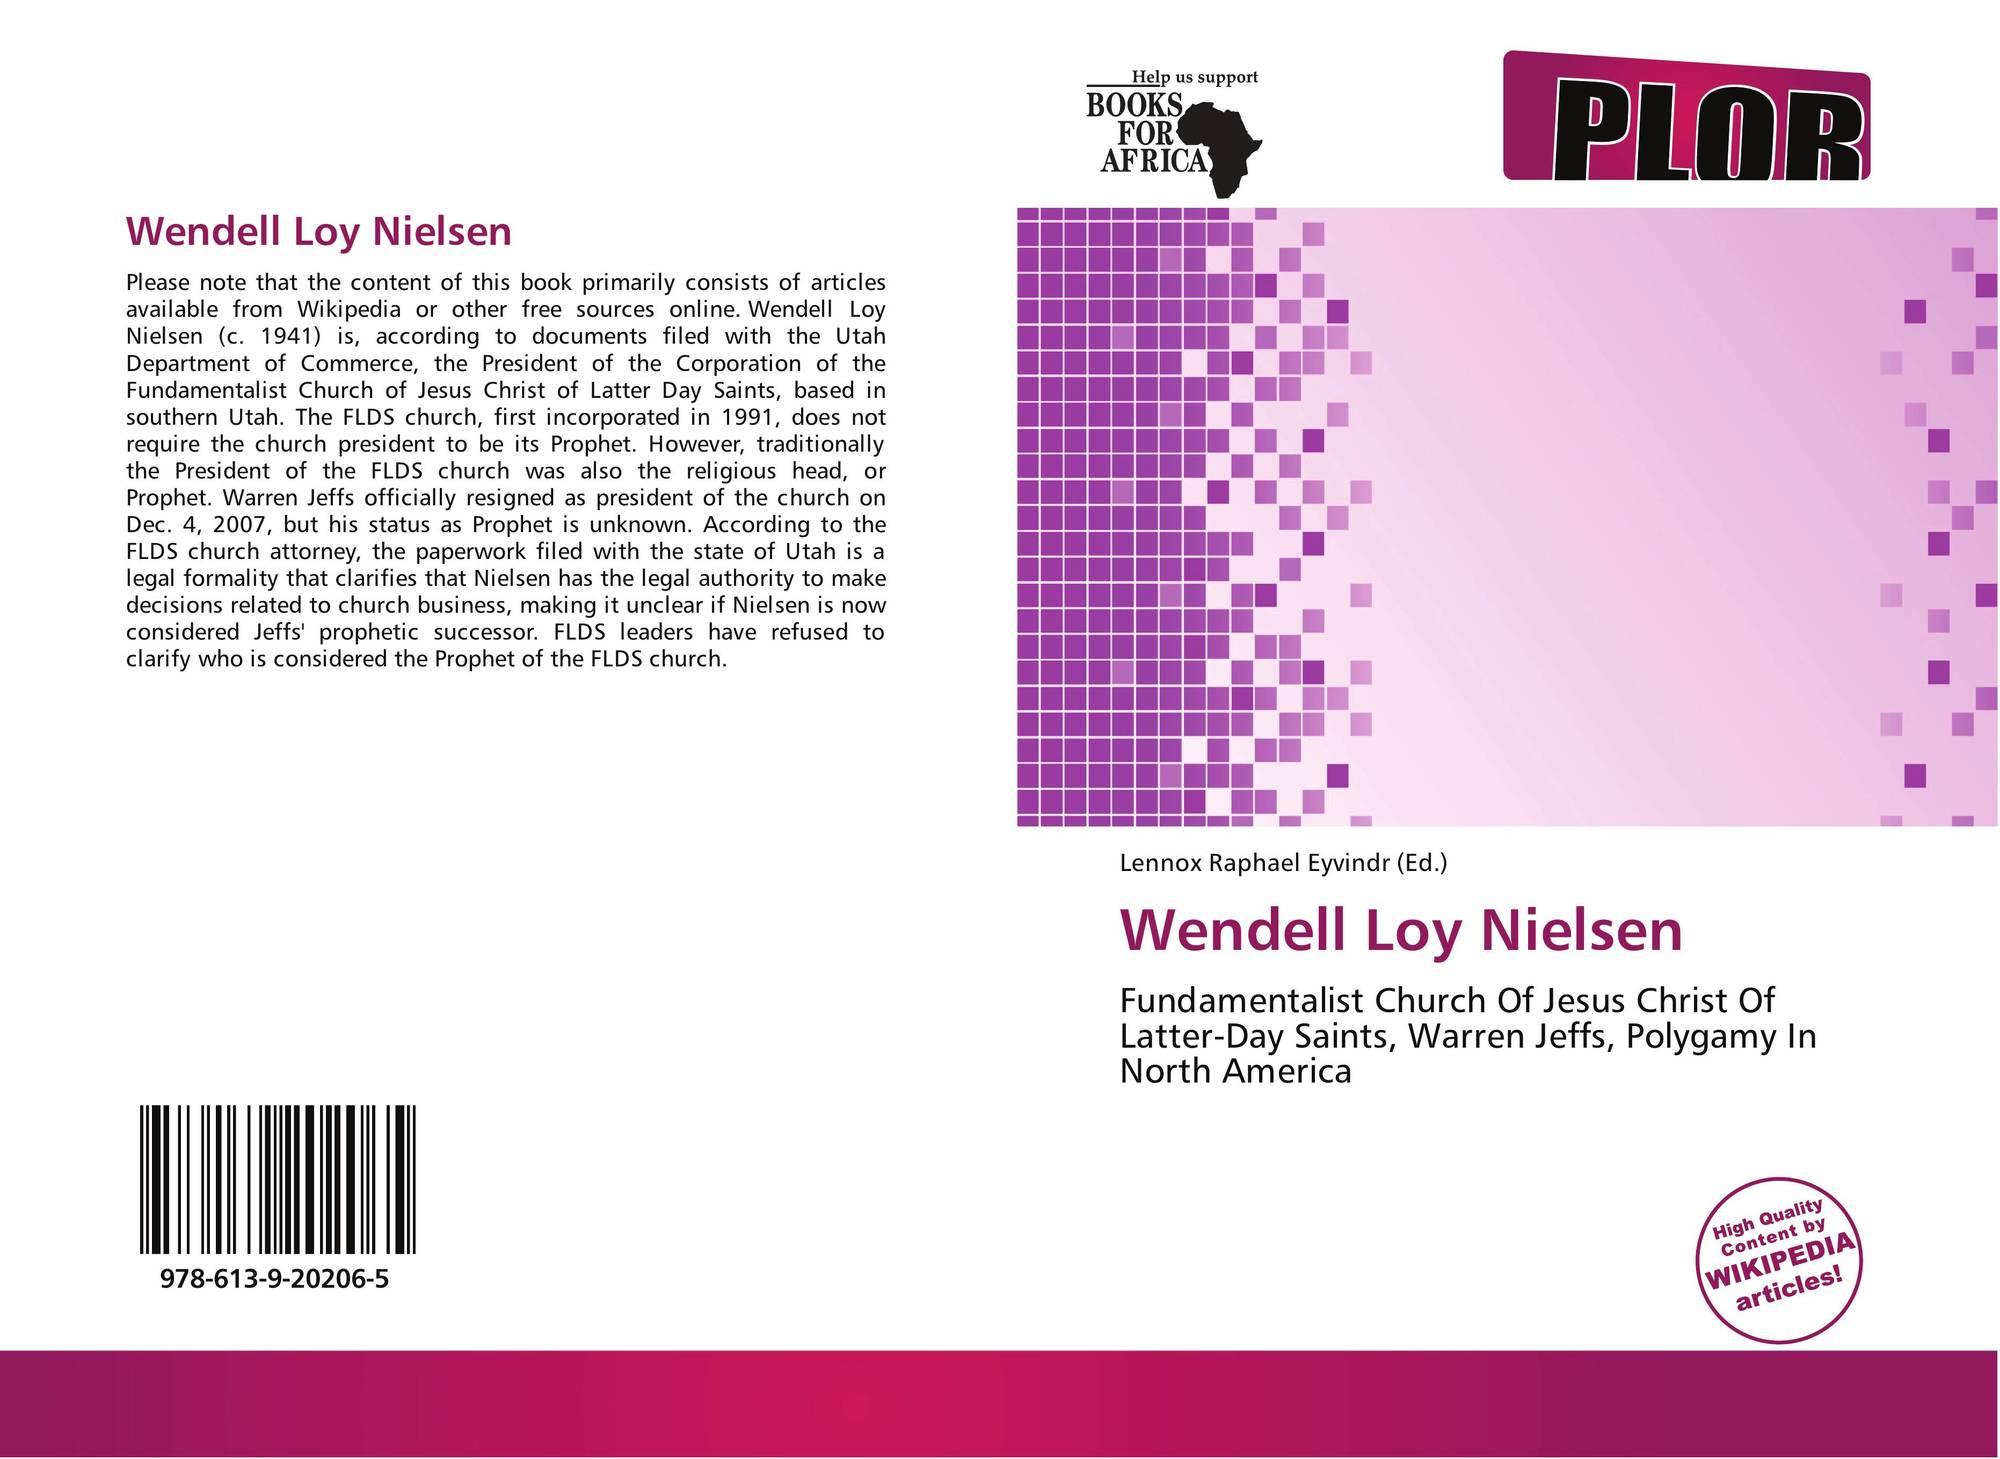 Wendell Loy Nielsen